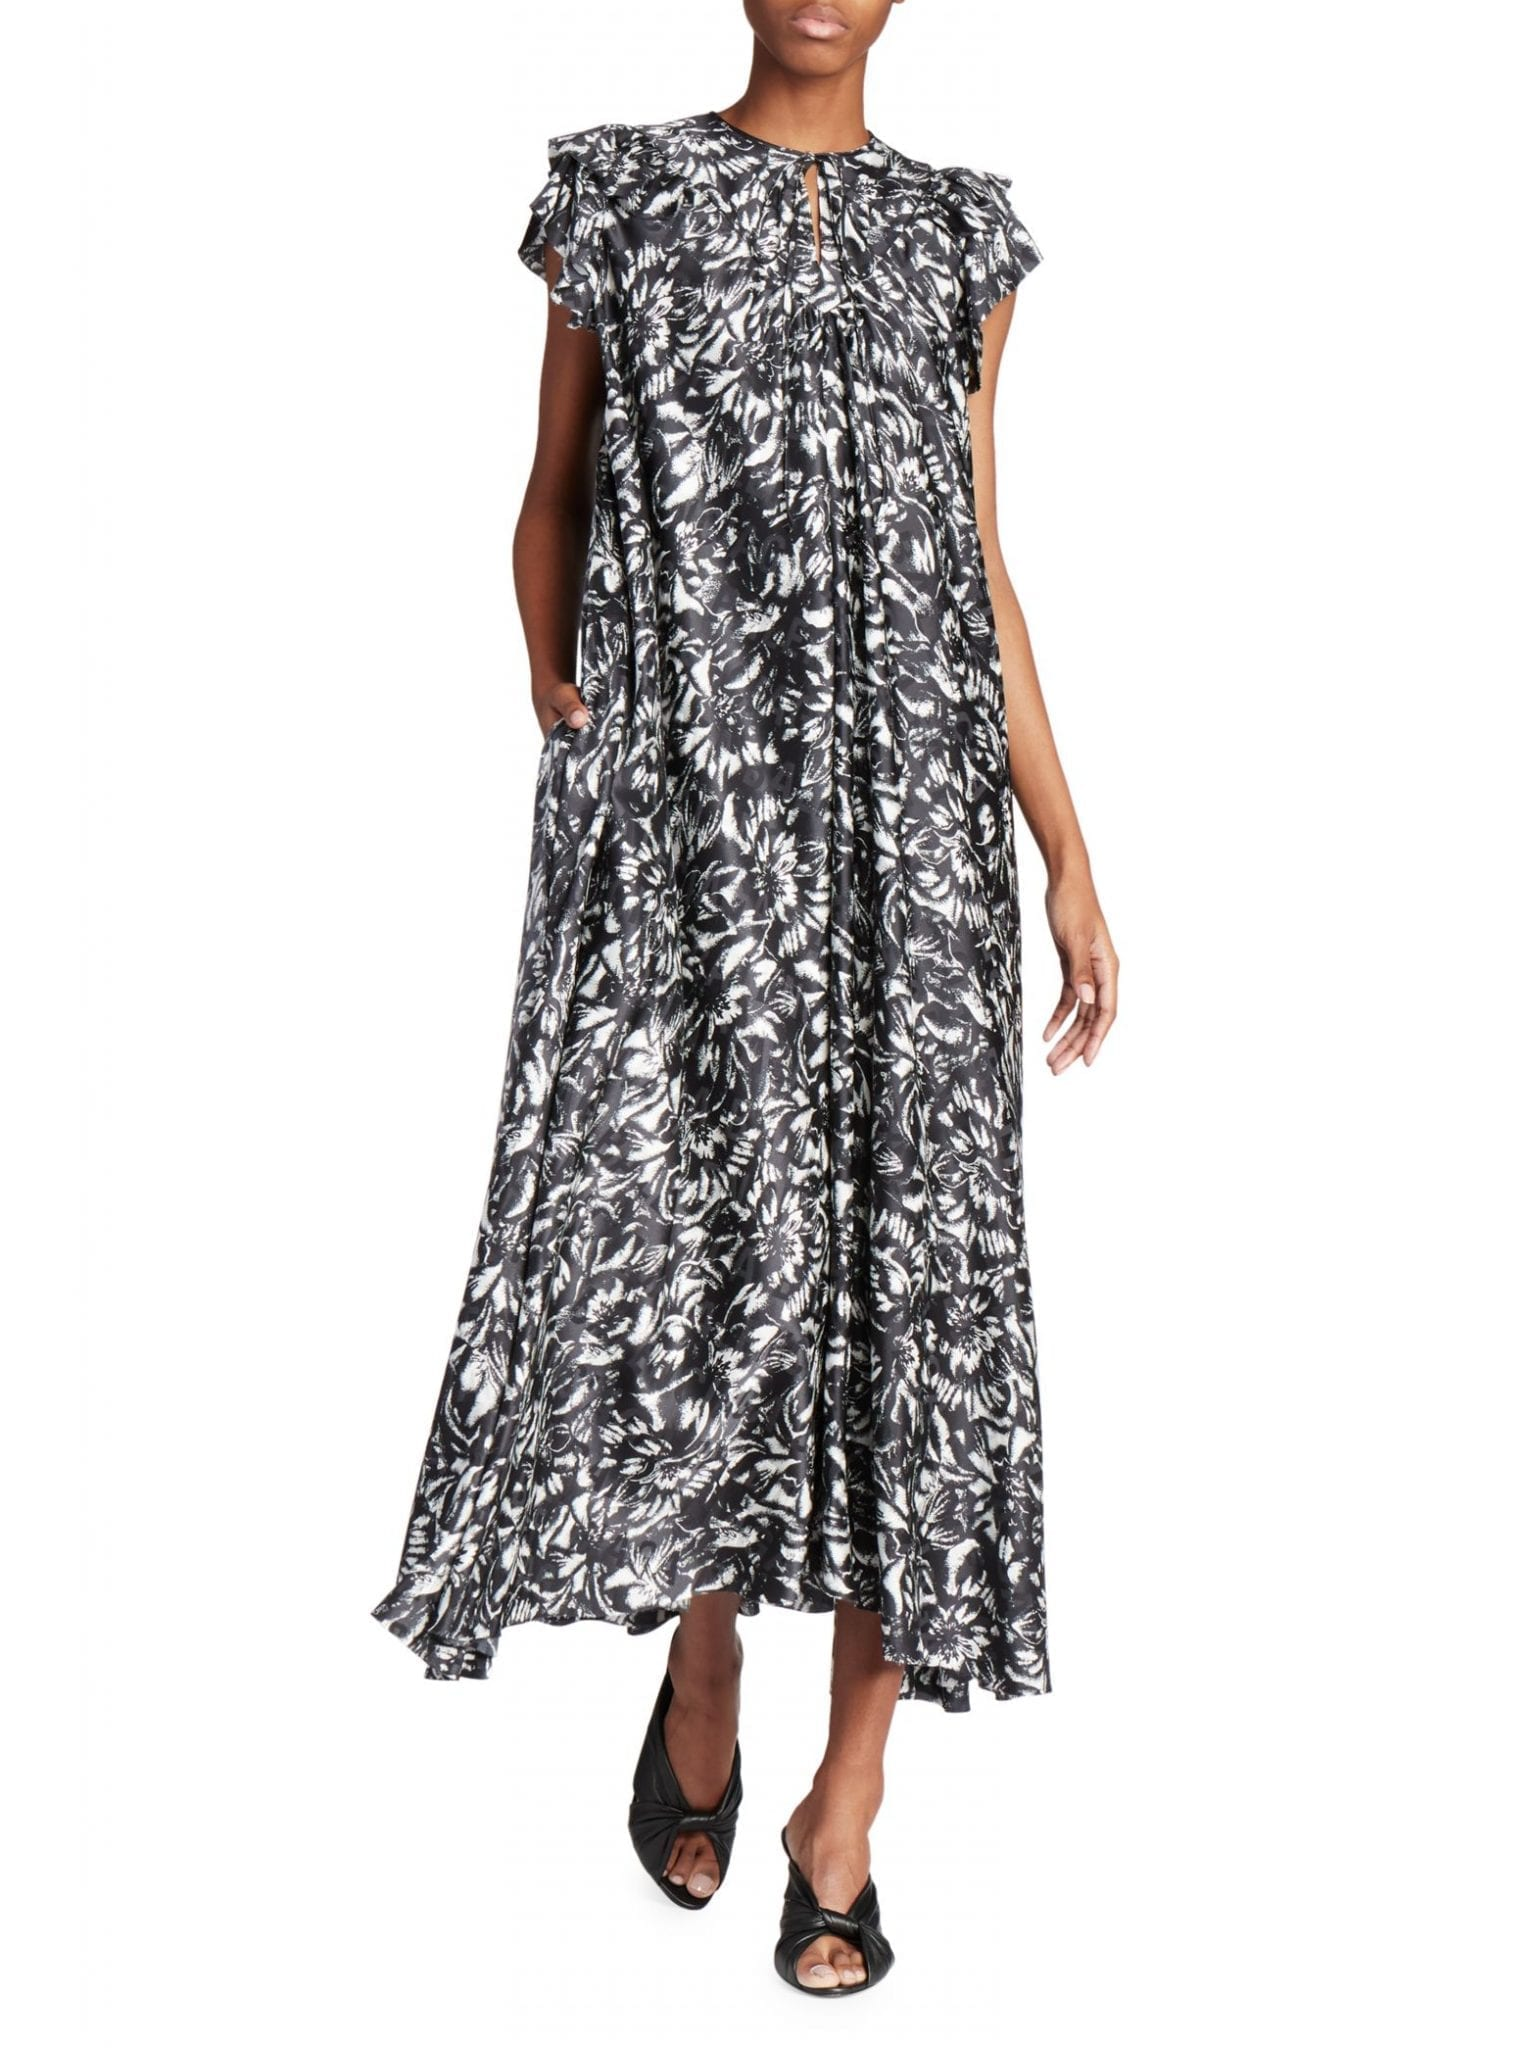 BALENCIAGA Flou Printed Silk Midii Dress